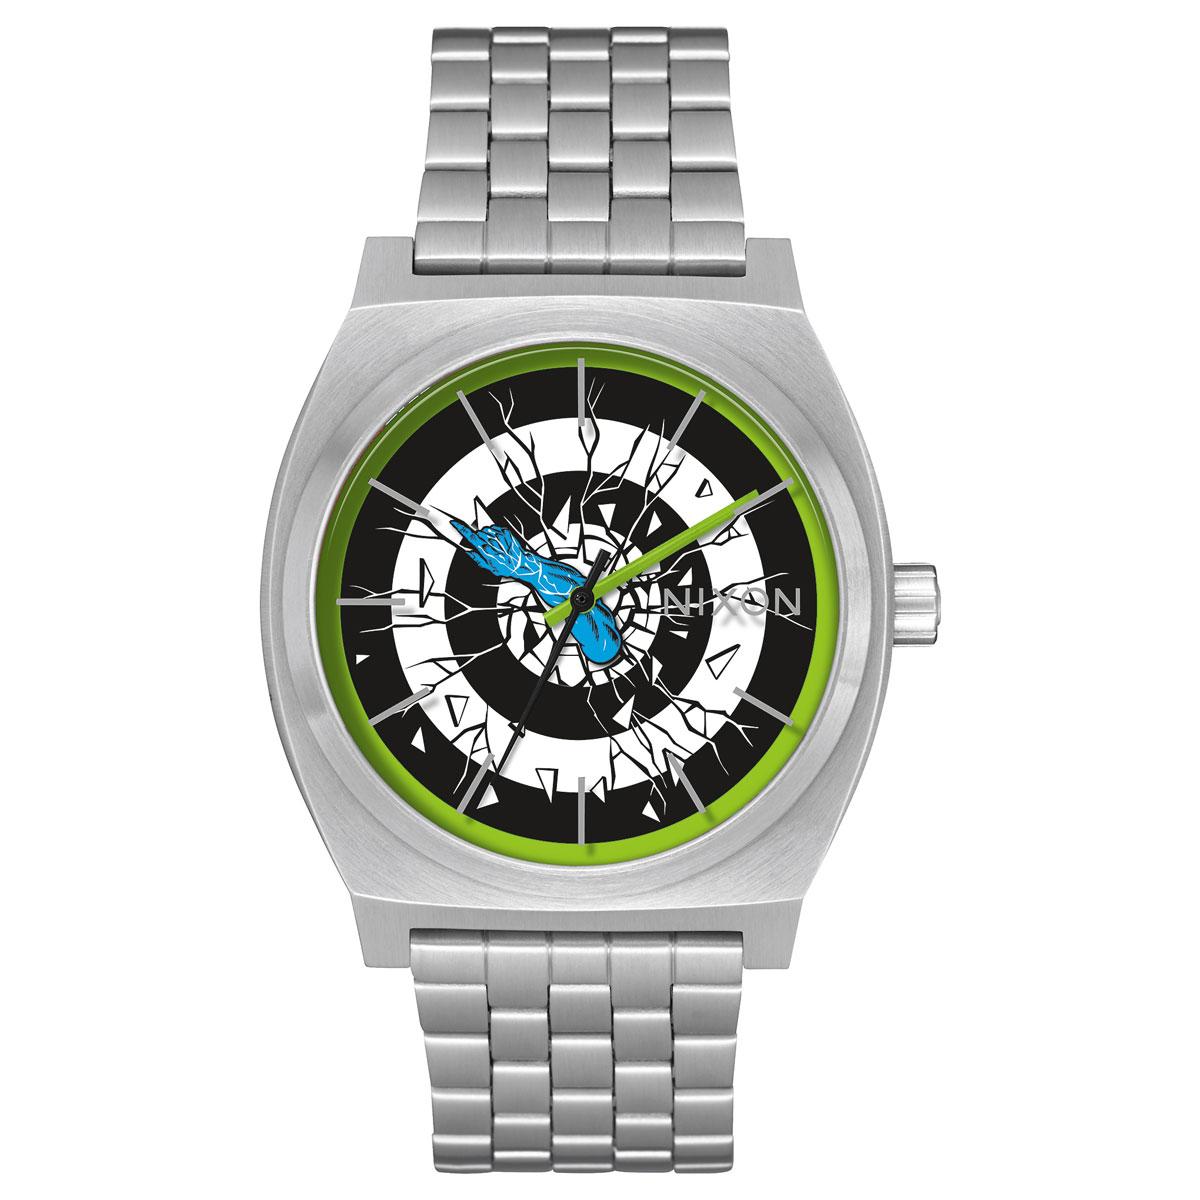 NIXON TIME TELLER(ニクソン タイム テラー ロスコップ)SILVER/ROSKOPP【メンズ レディース 腕時計】17HO-I